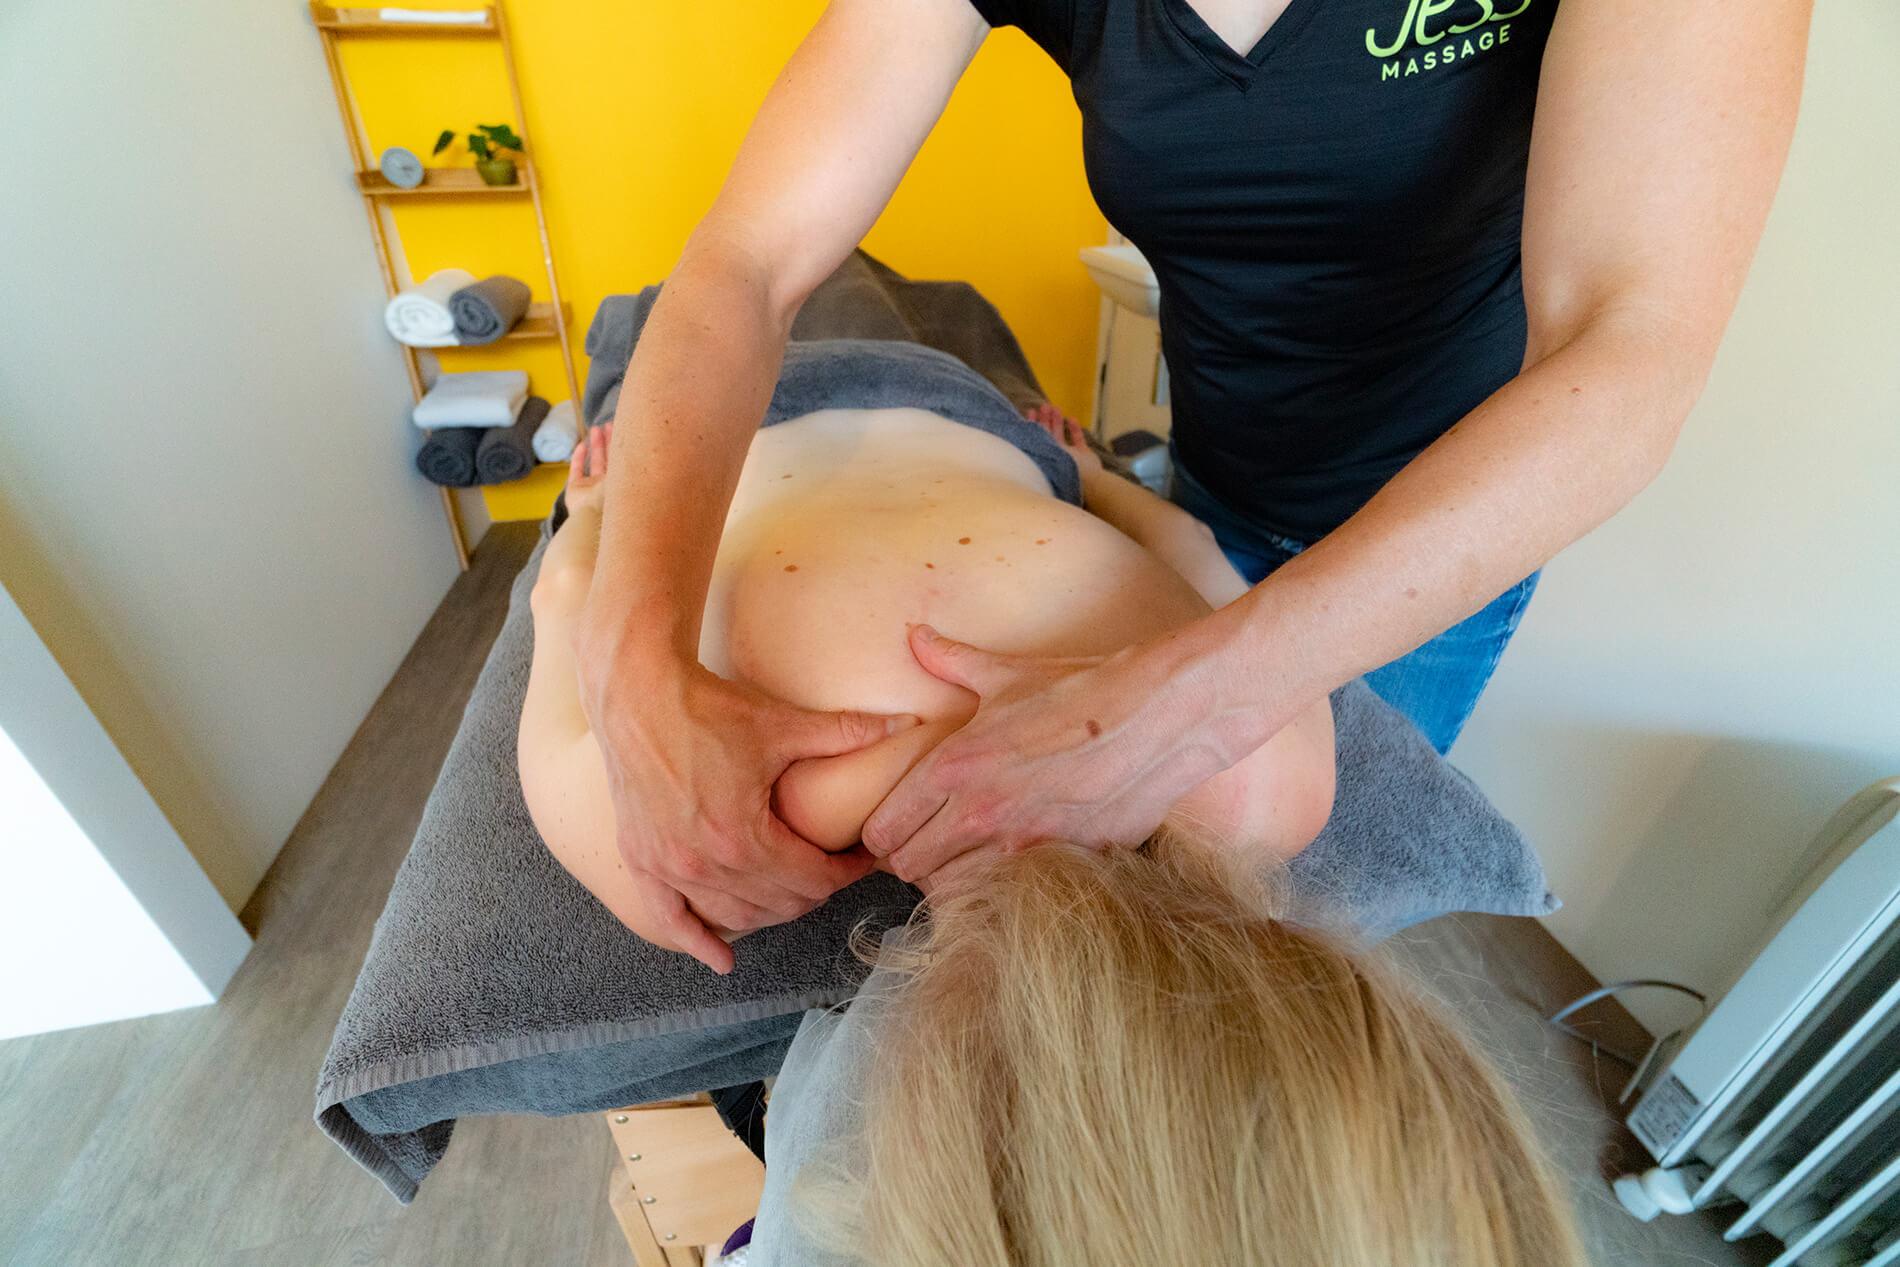 JessMassage | Sportmassage Meppel